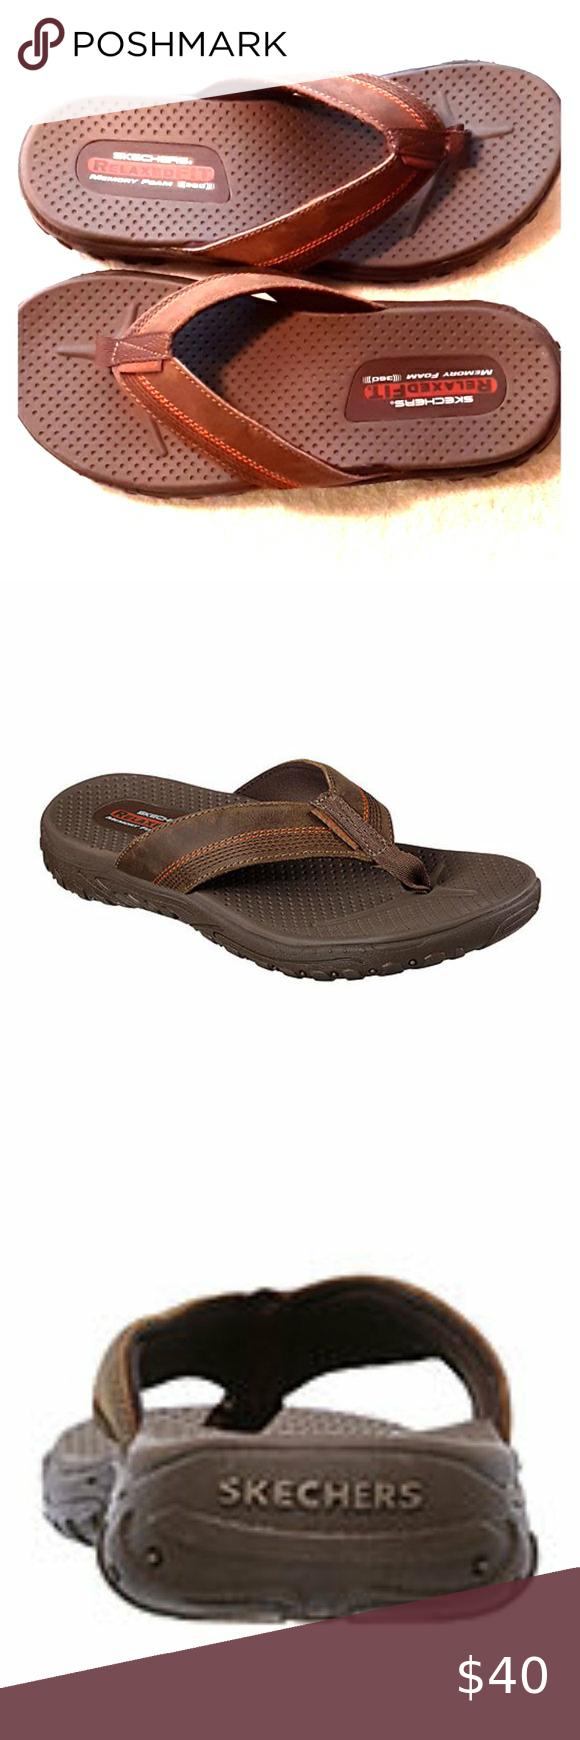 comprender tortura repetir  Mens Skechers Brown Reggae Cobano Flipflop Sandal New without box. See  label on bottom of shoe. Skechers Men's Brown Reg… | Mens skechers, Skechers,  Sandal fashion